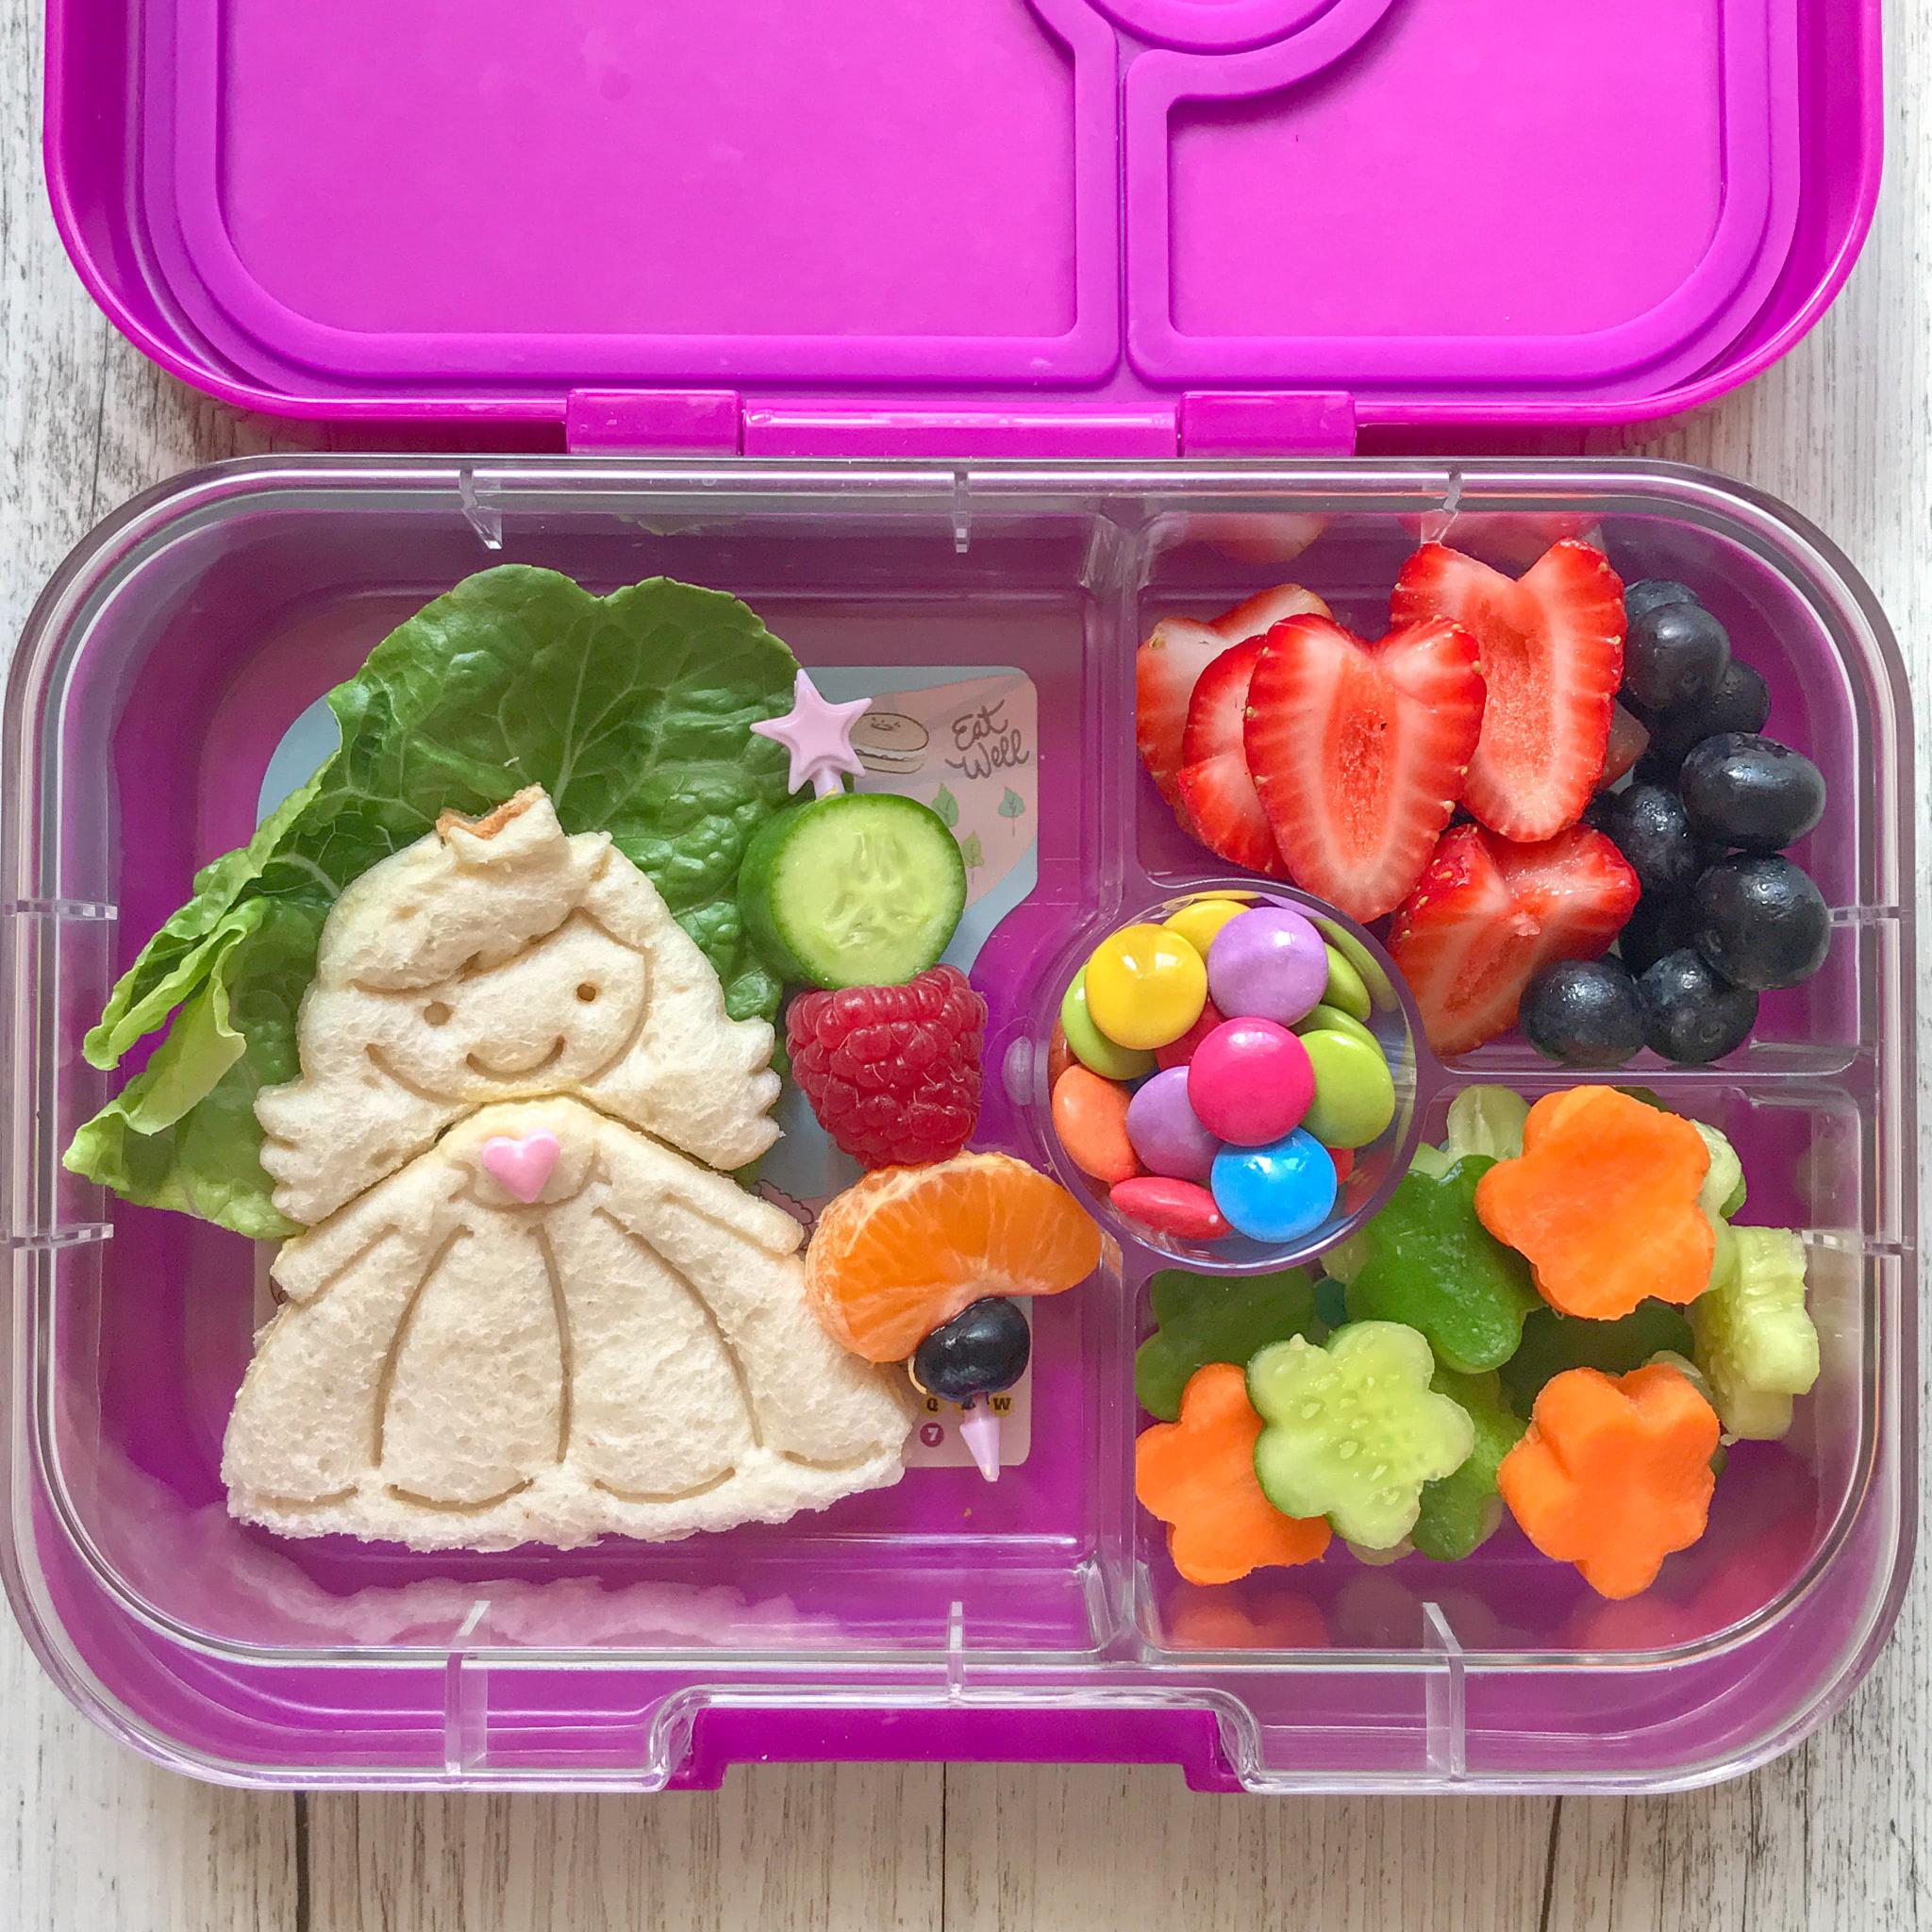 Lunch Punch Sandwich Cutters - Princess-2